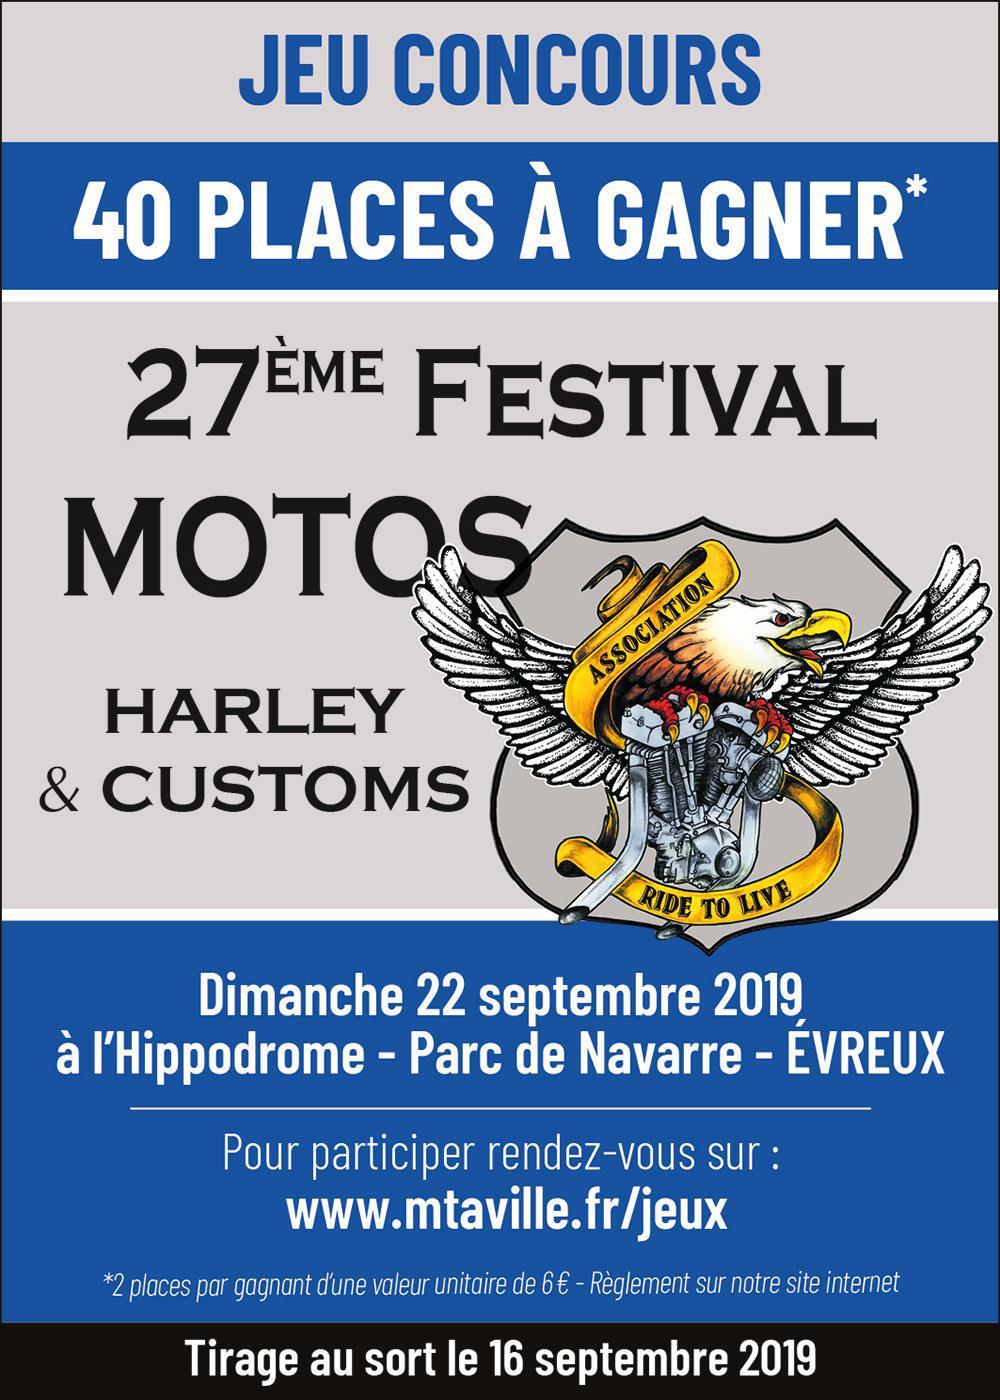 Jeu concours - 27ème Festival Ride to Live